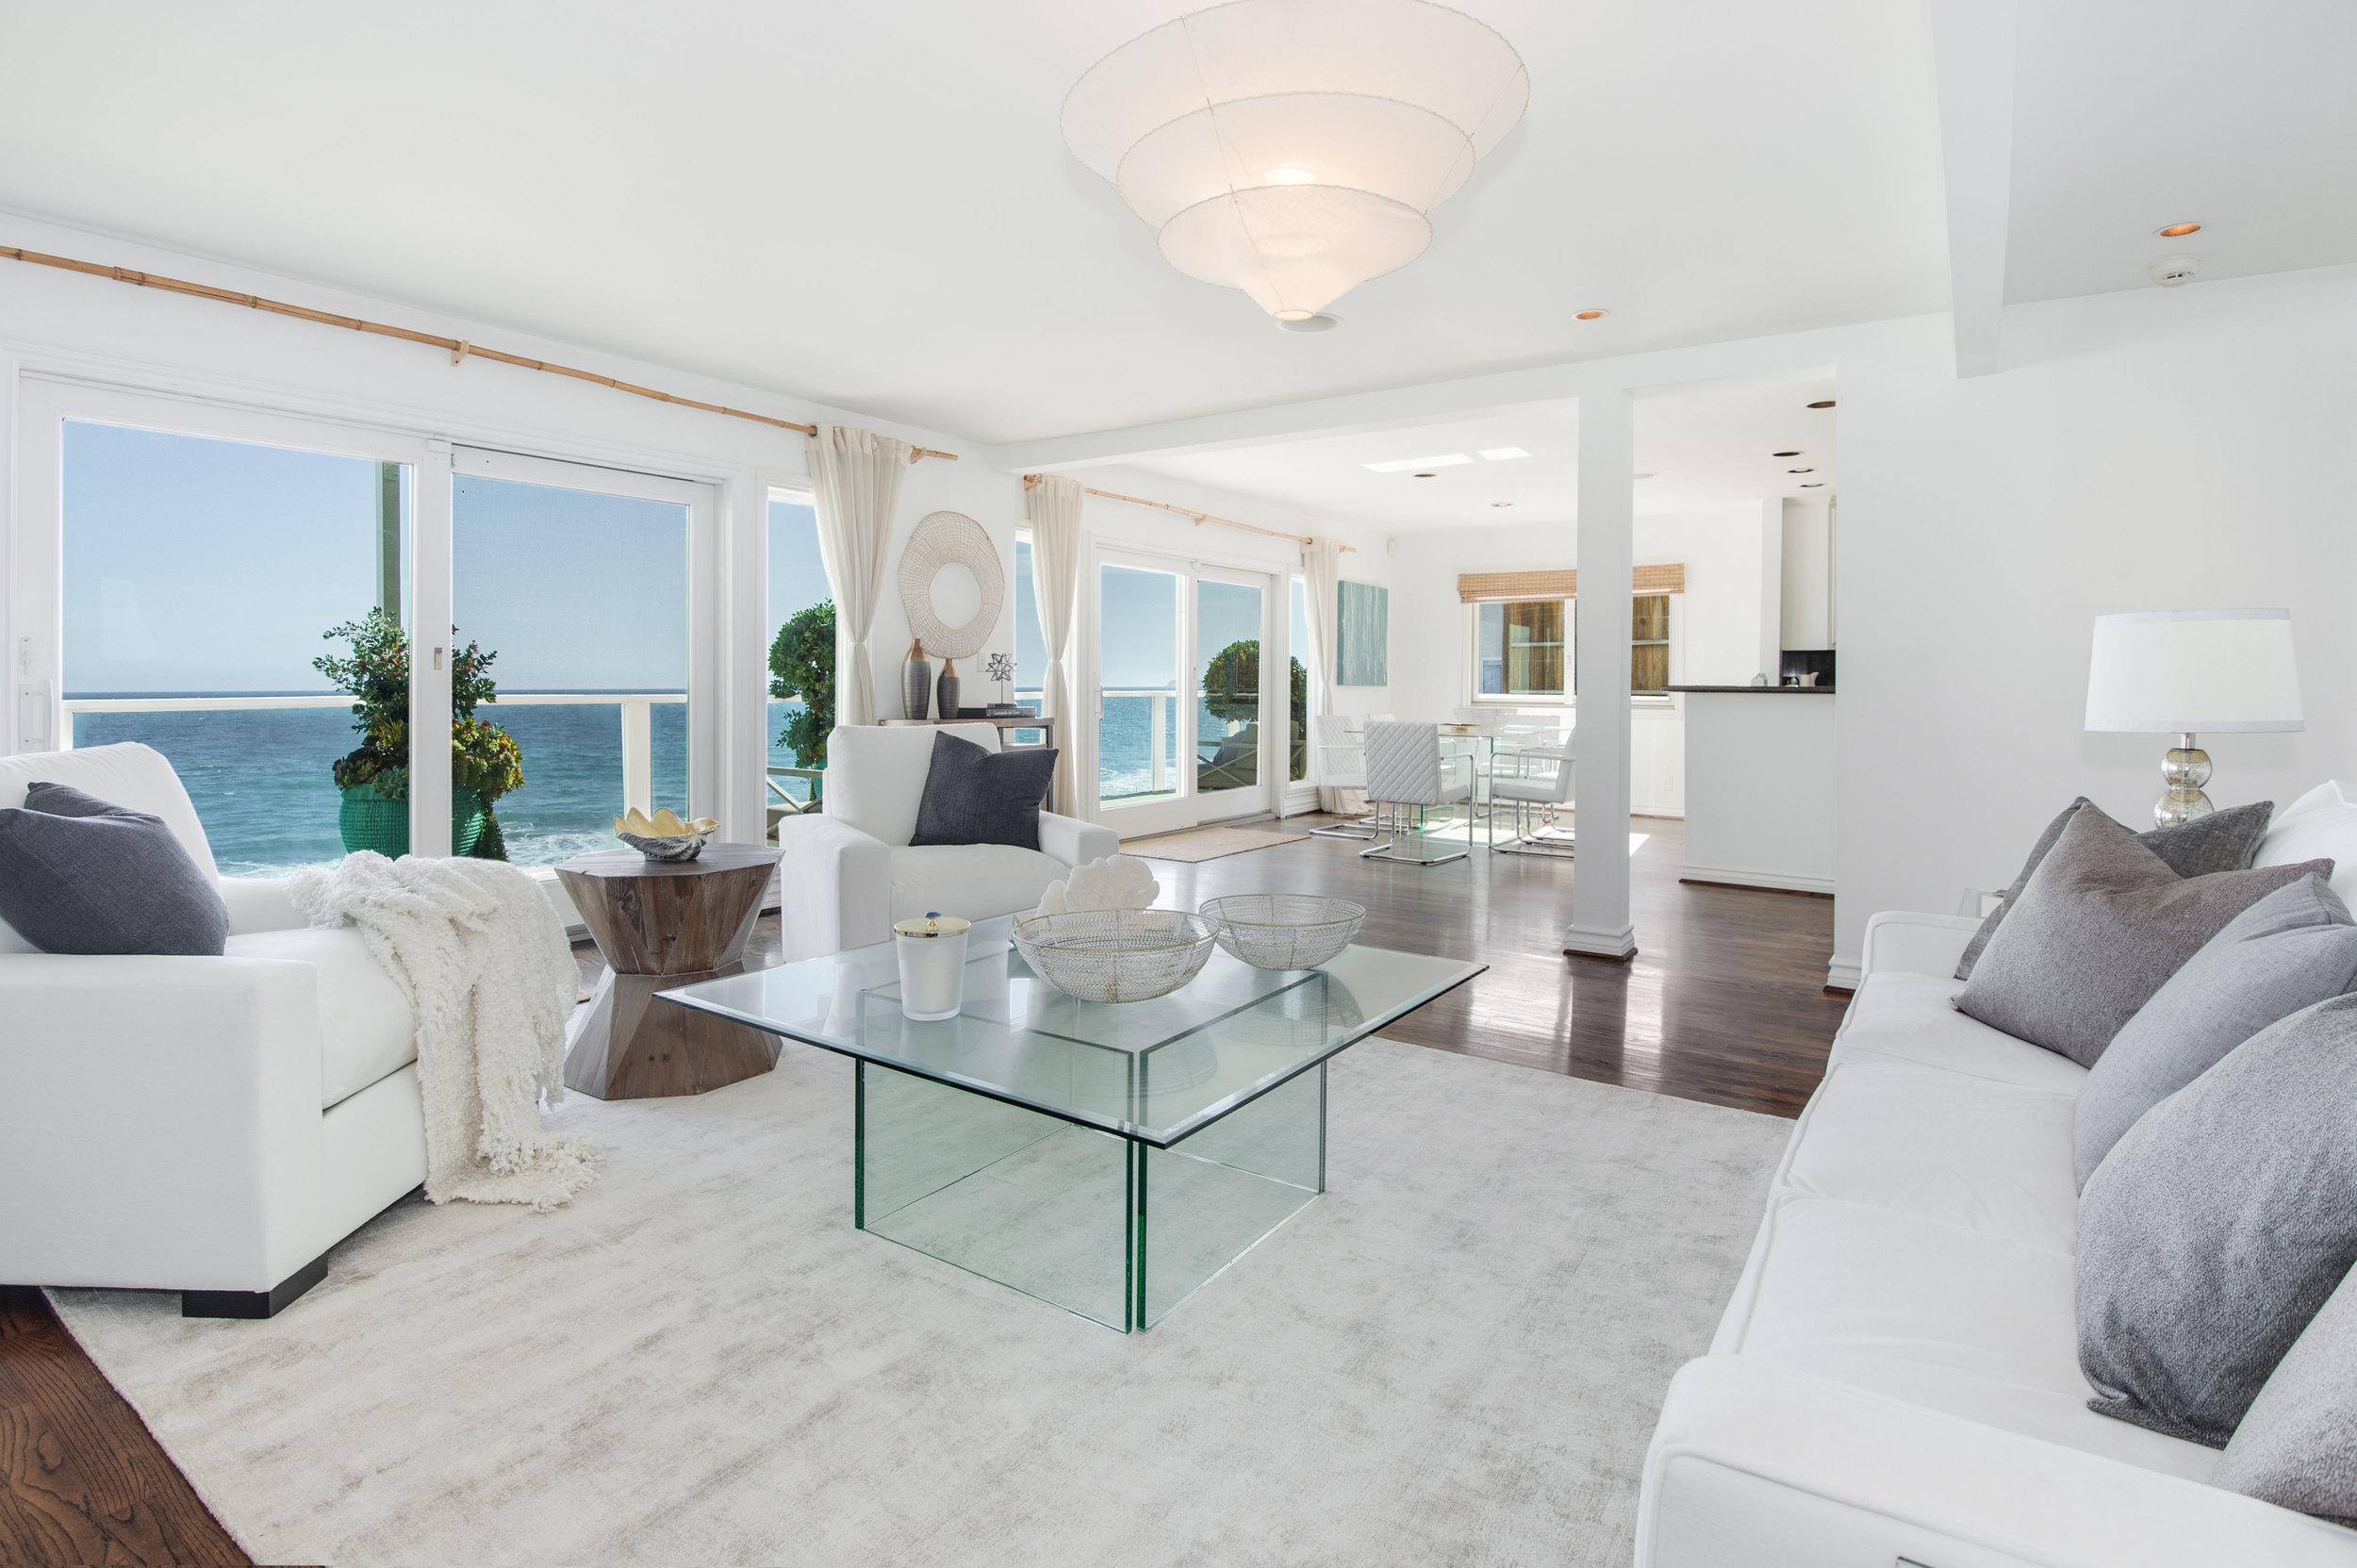 003 Living Room 25342 Malibu Road For Sale Lease The Malibu Life Team Luxury Real Estate.jpg